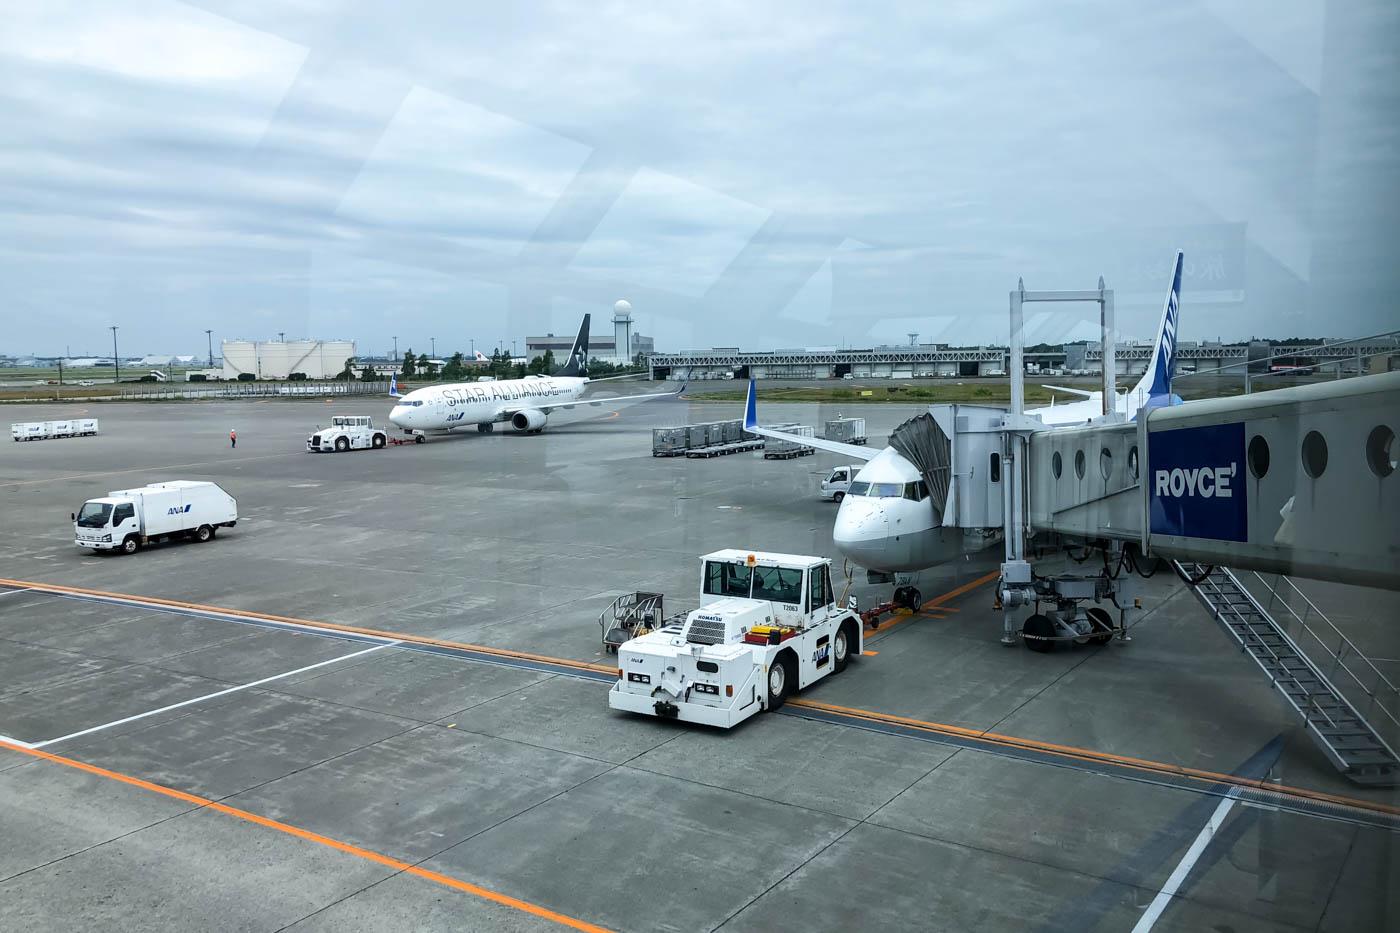 ANA 737-800 at Sapporo New Chitose